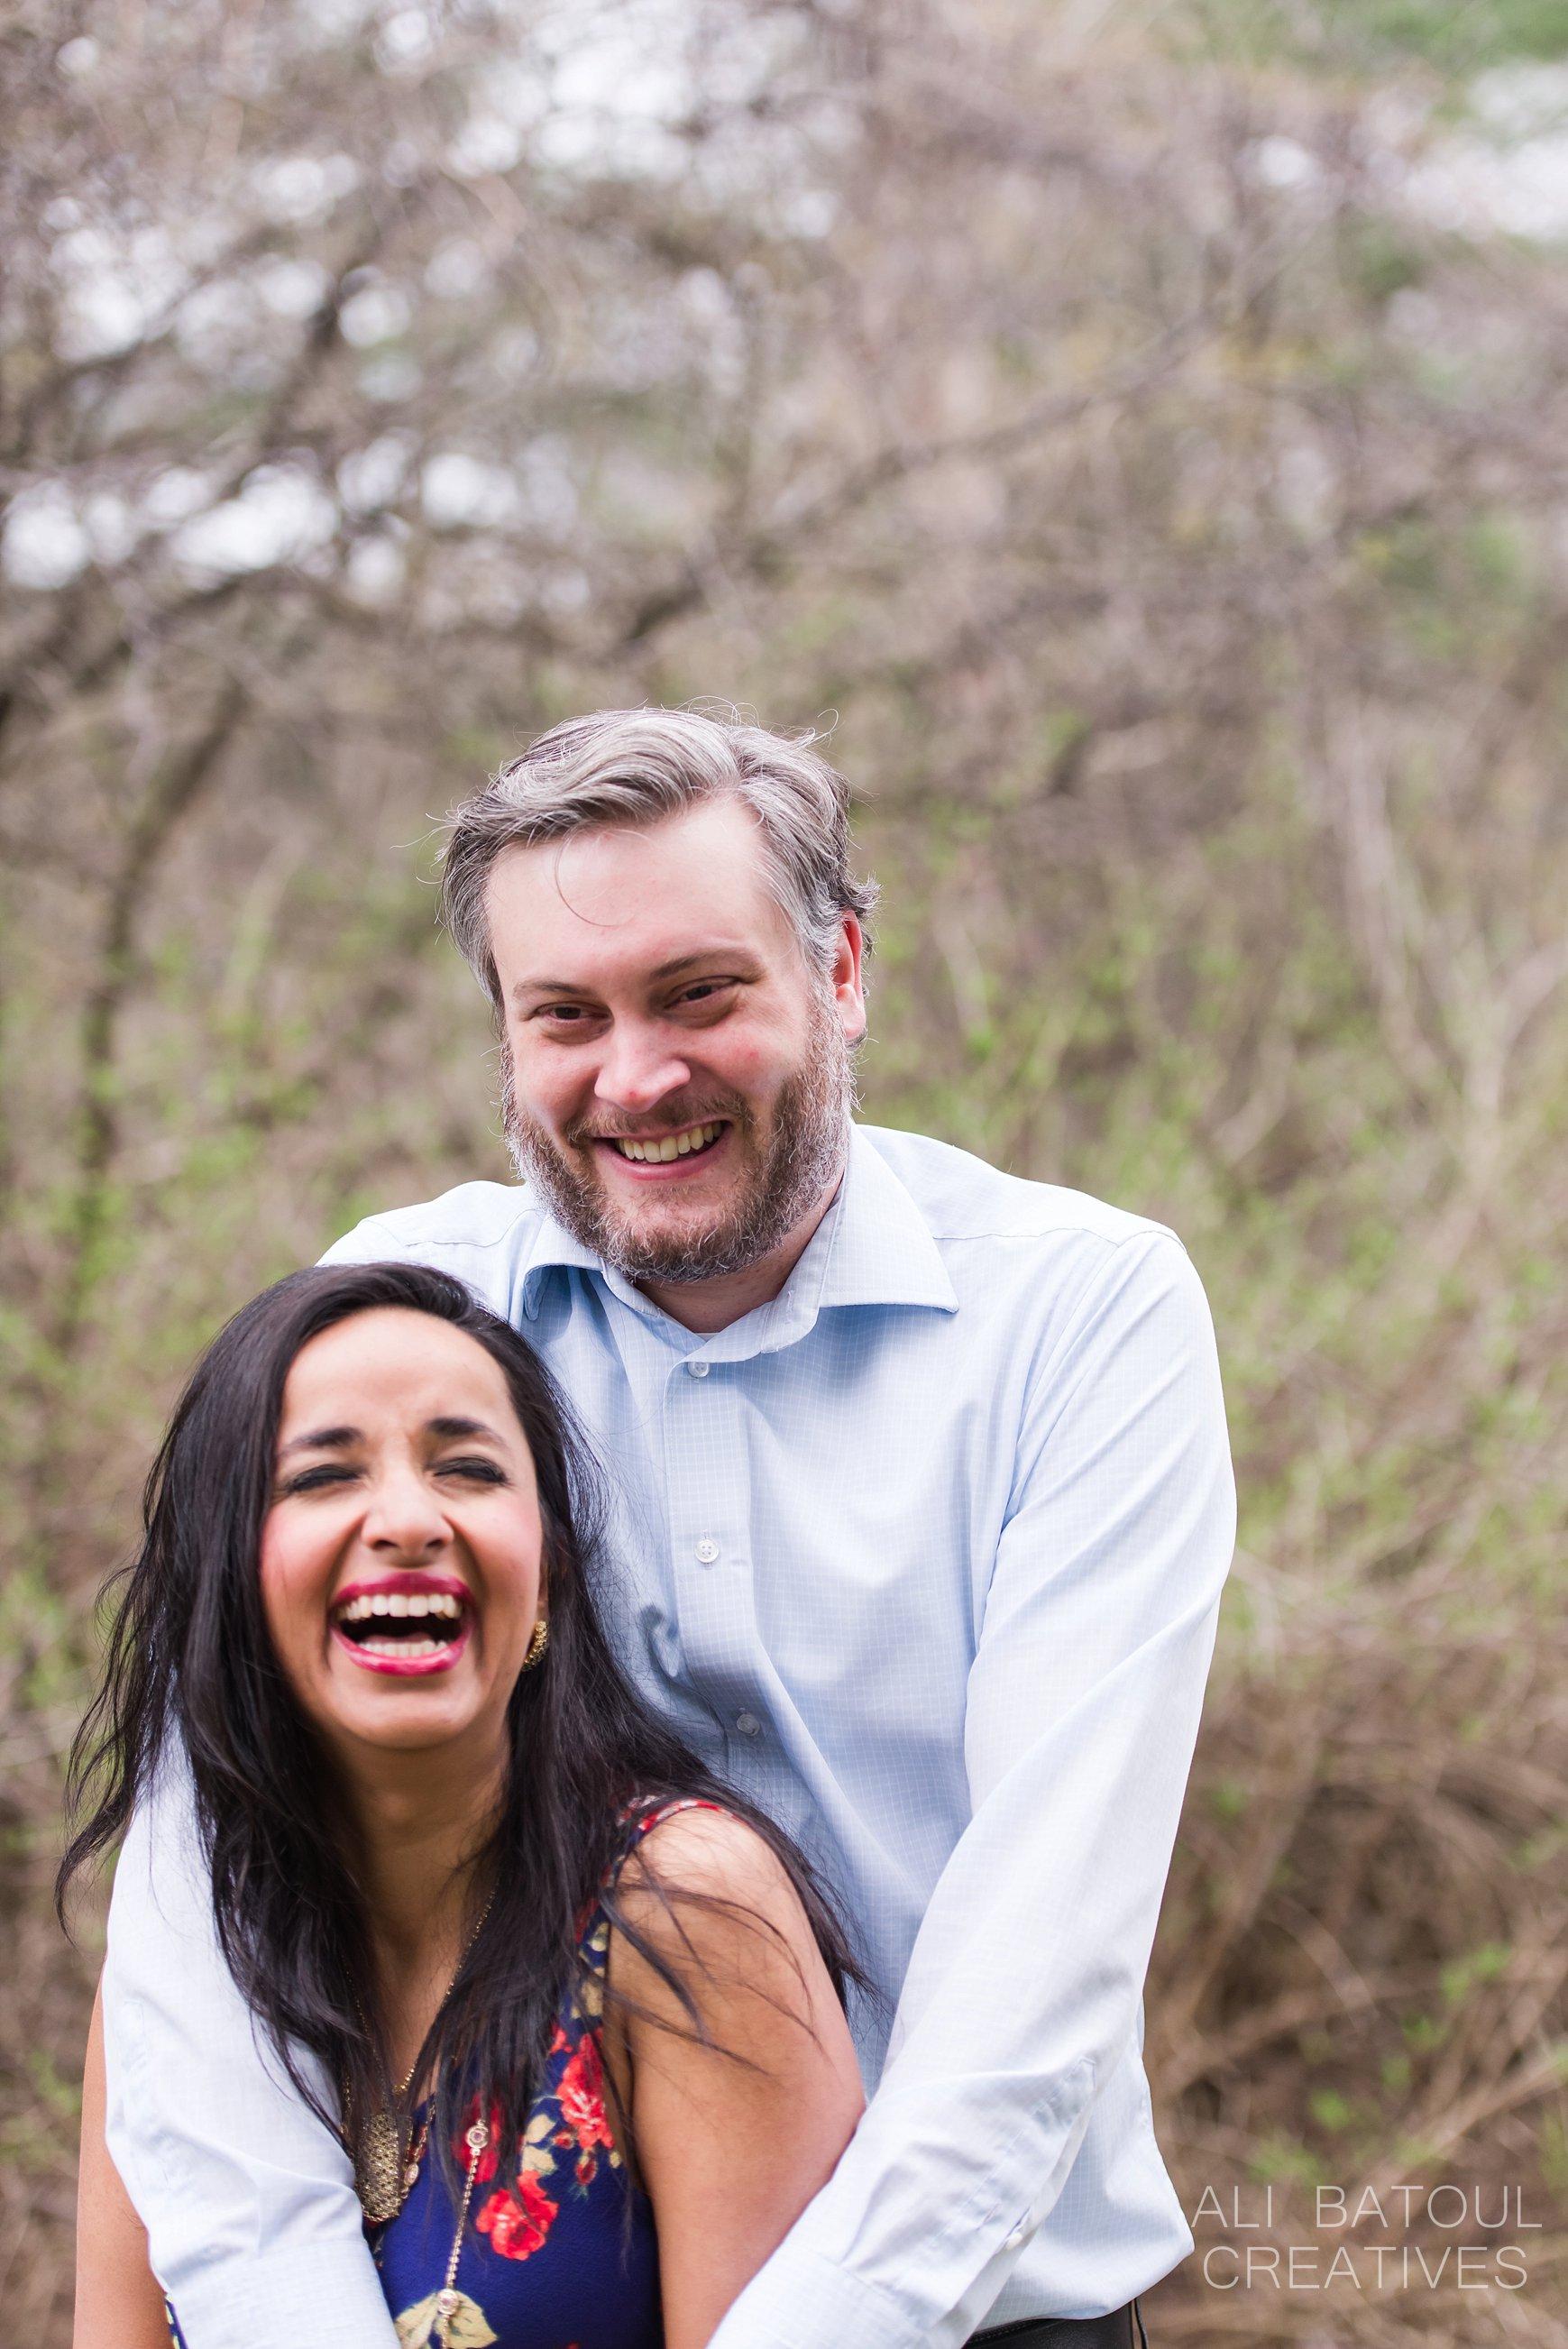 Uzma + Ian Engagement - Ali Batoul Creatives Fine Art Wedding Photography_0198.jpg